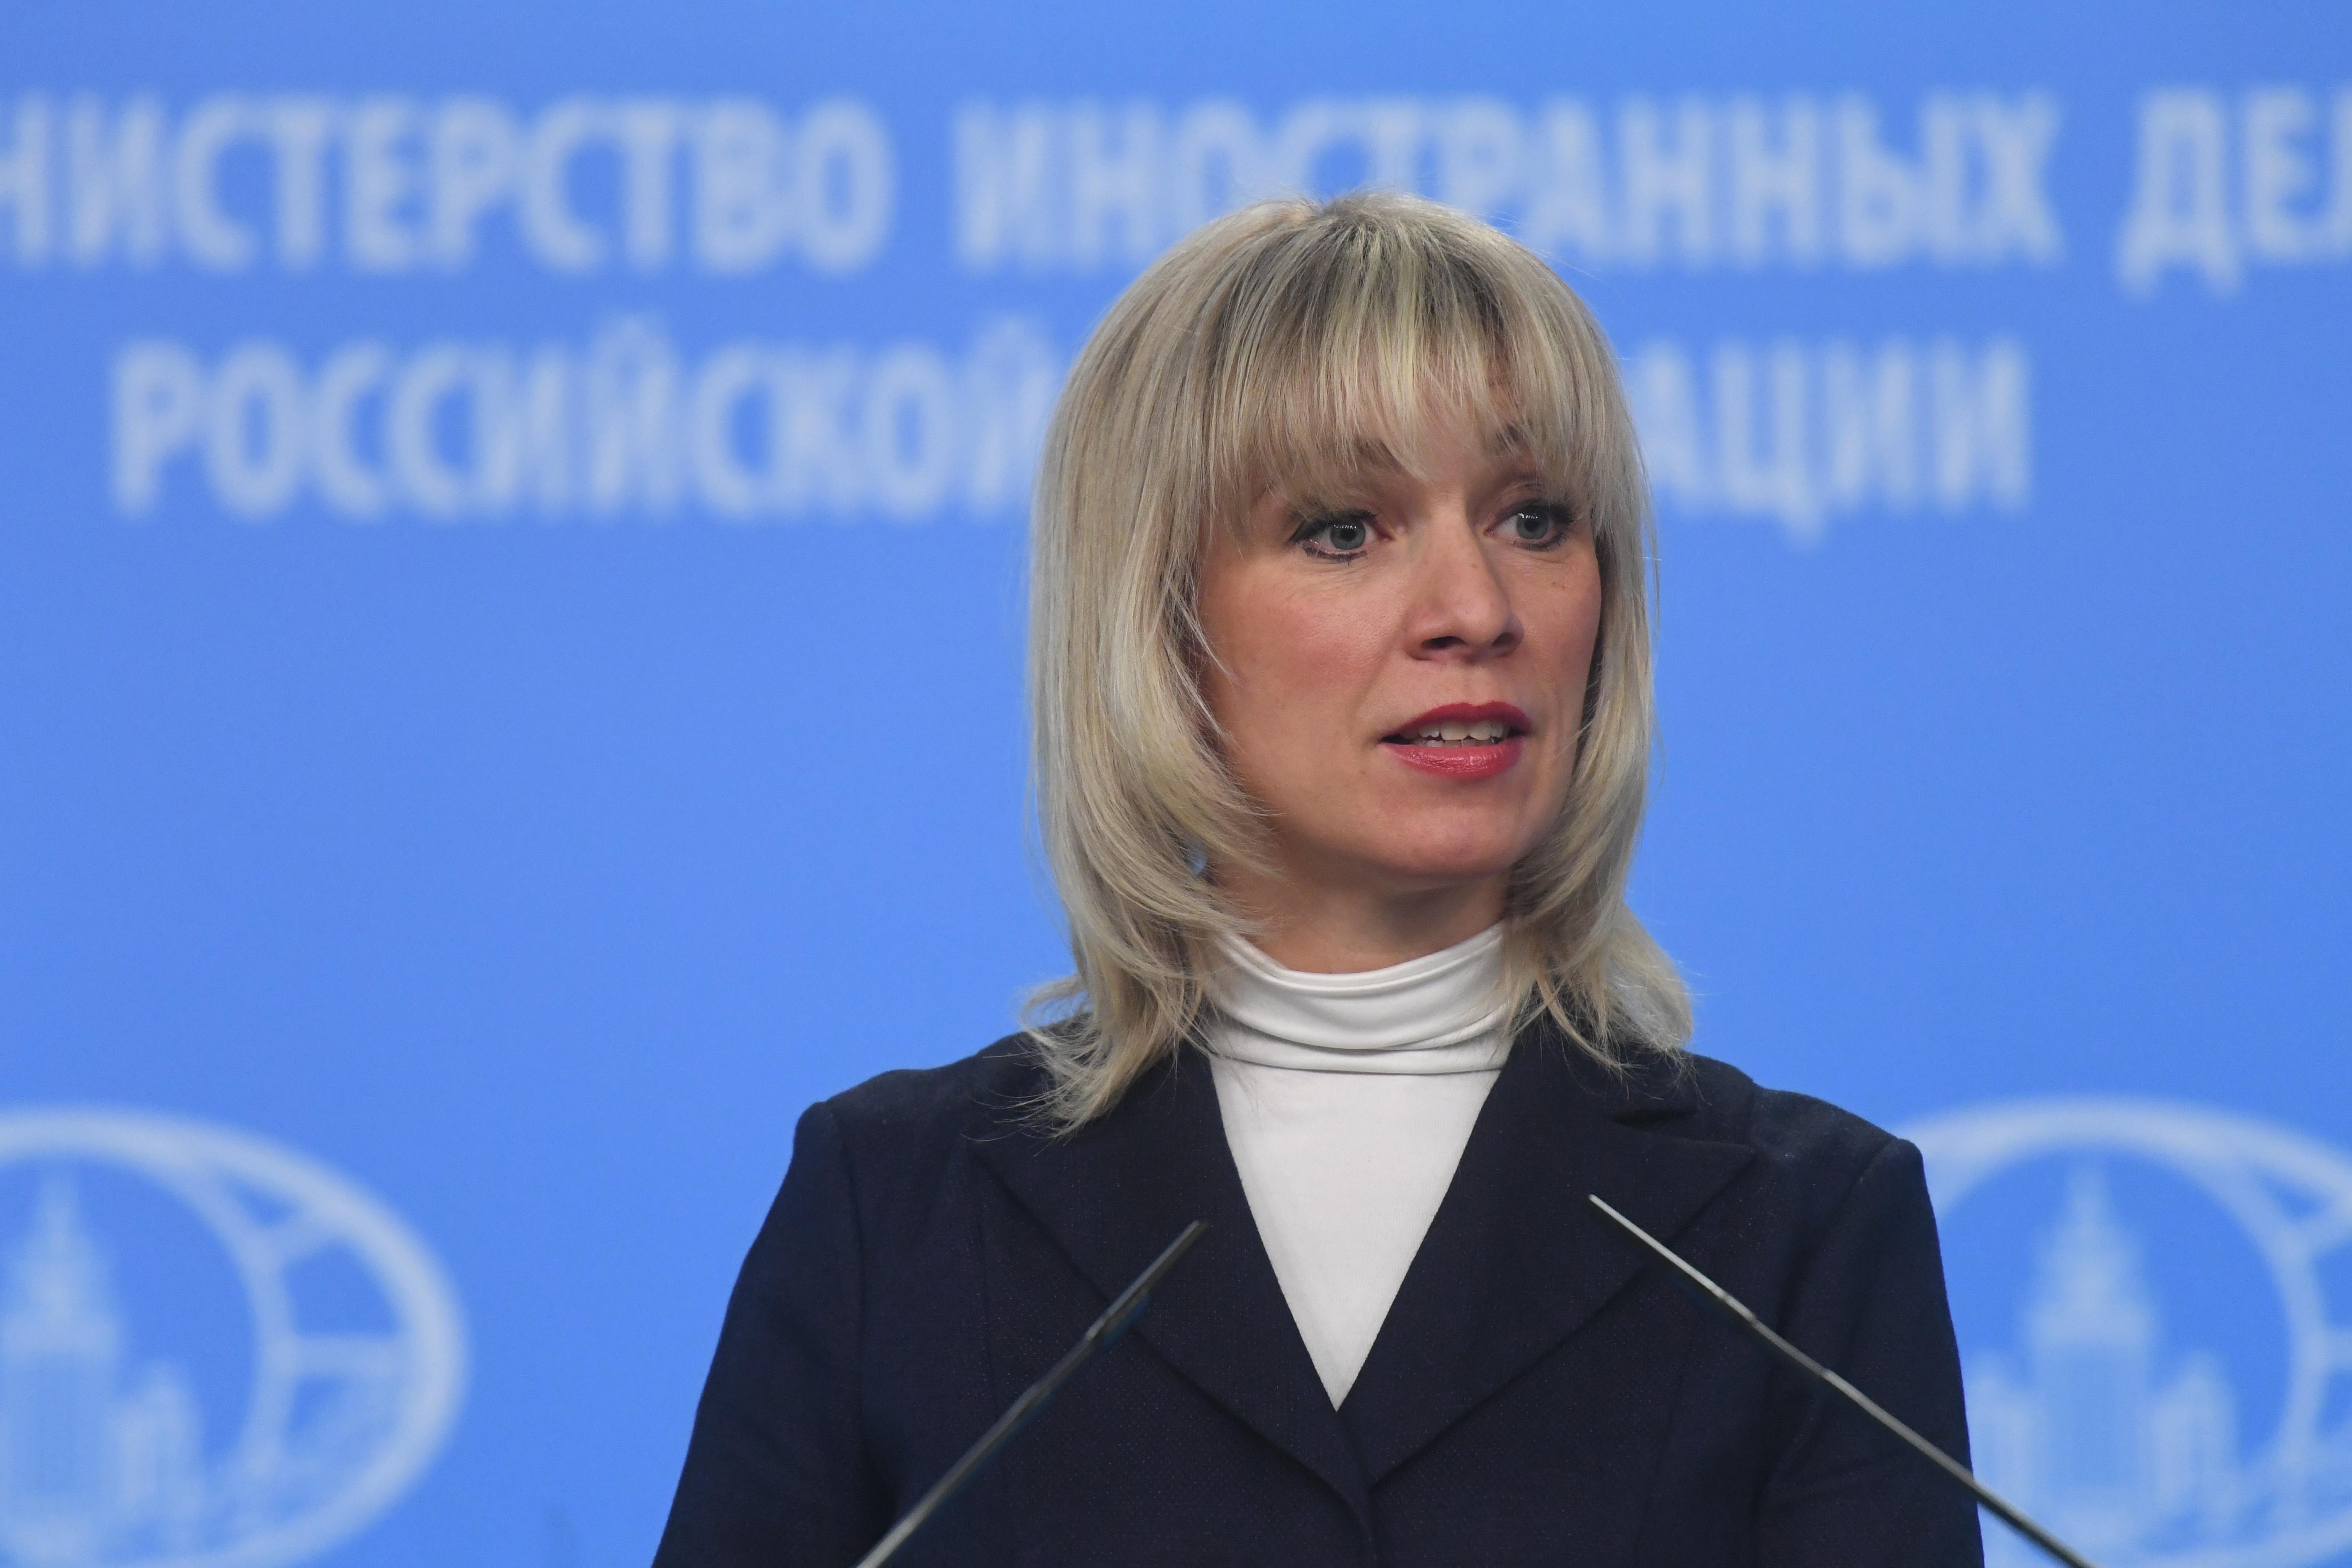 <p>Мария Захарова. Фото: &copy;РИА Новости/Кирилл Каллиников</p>